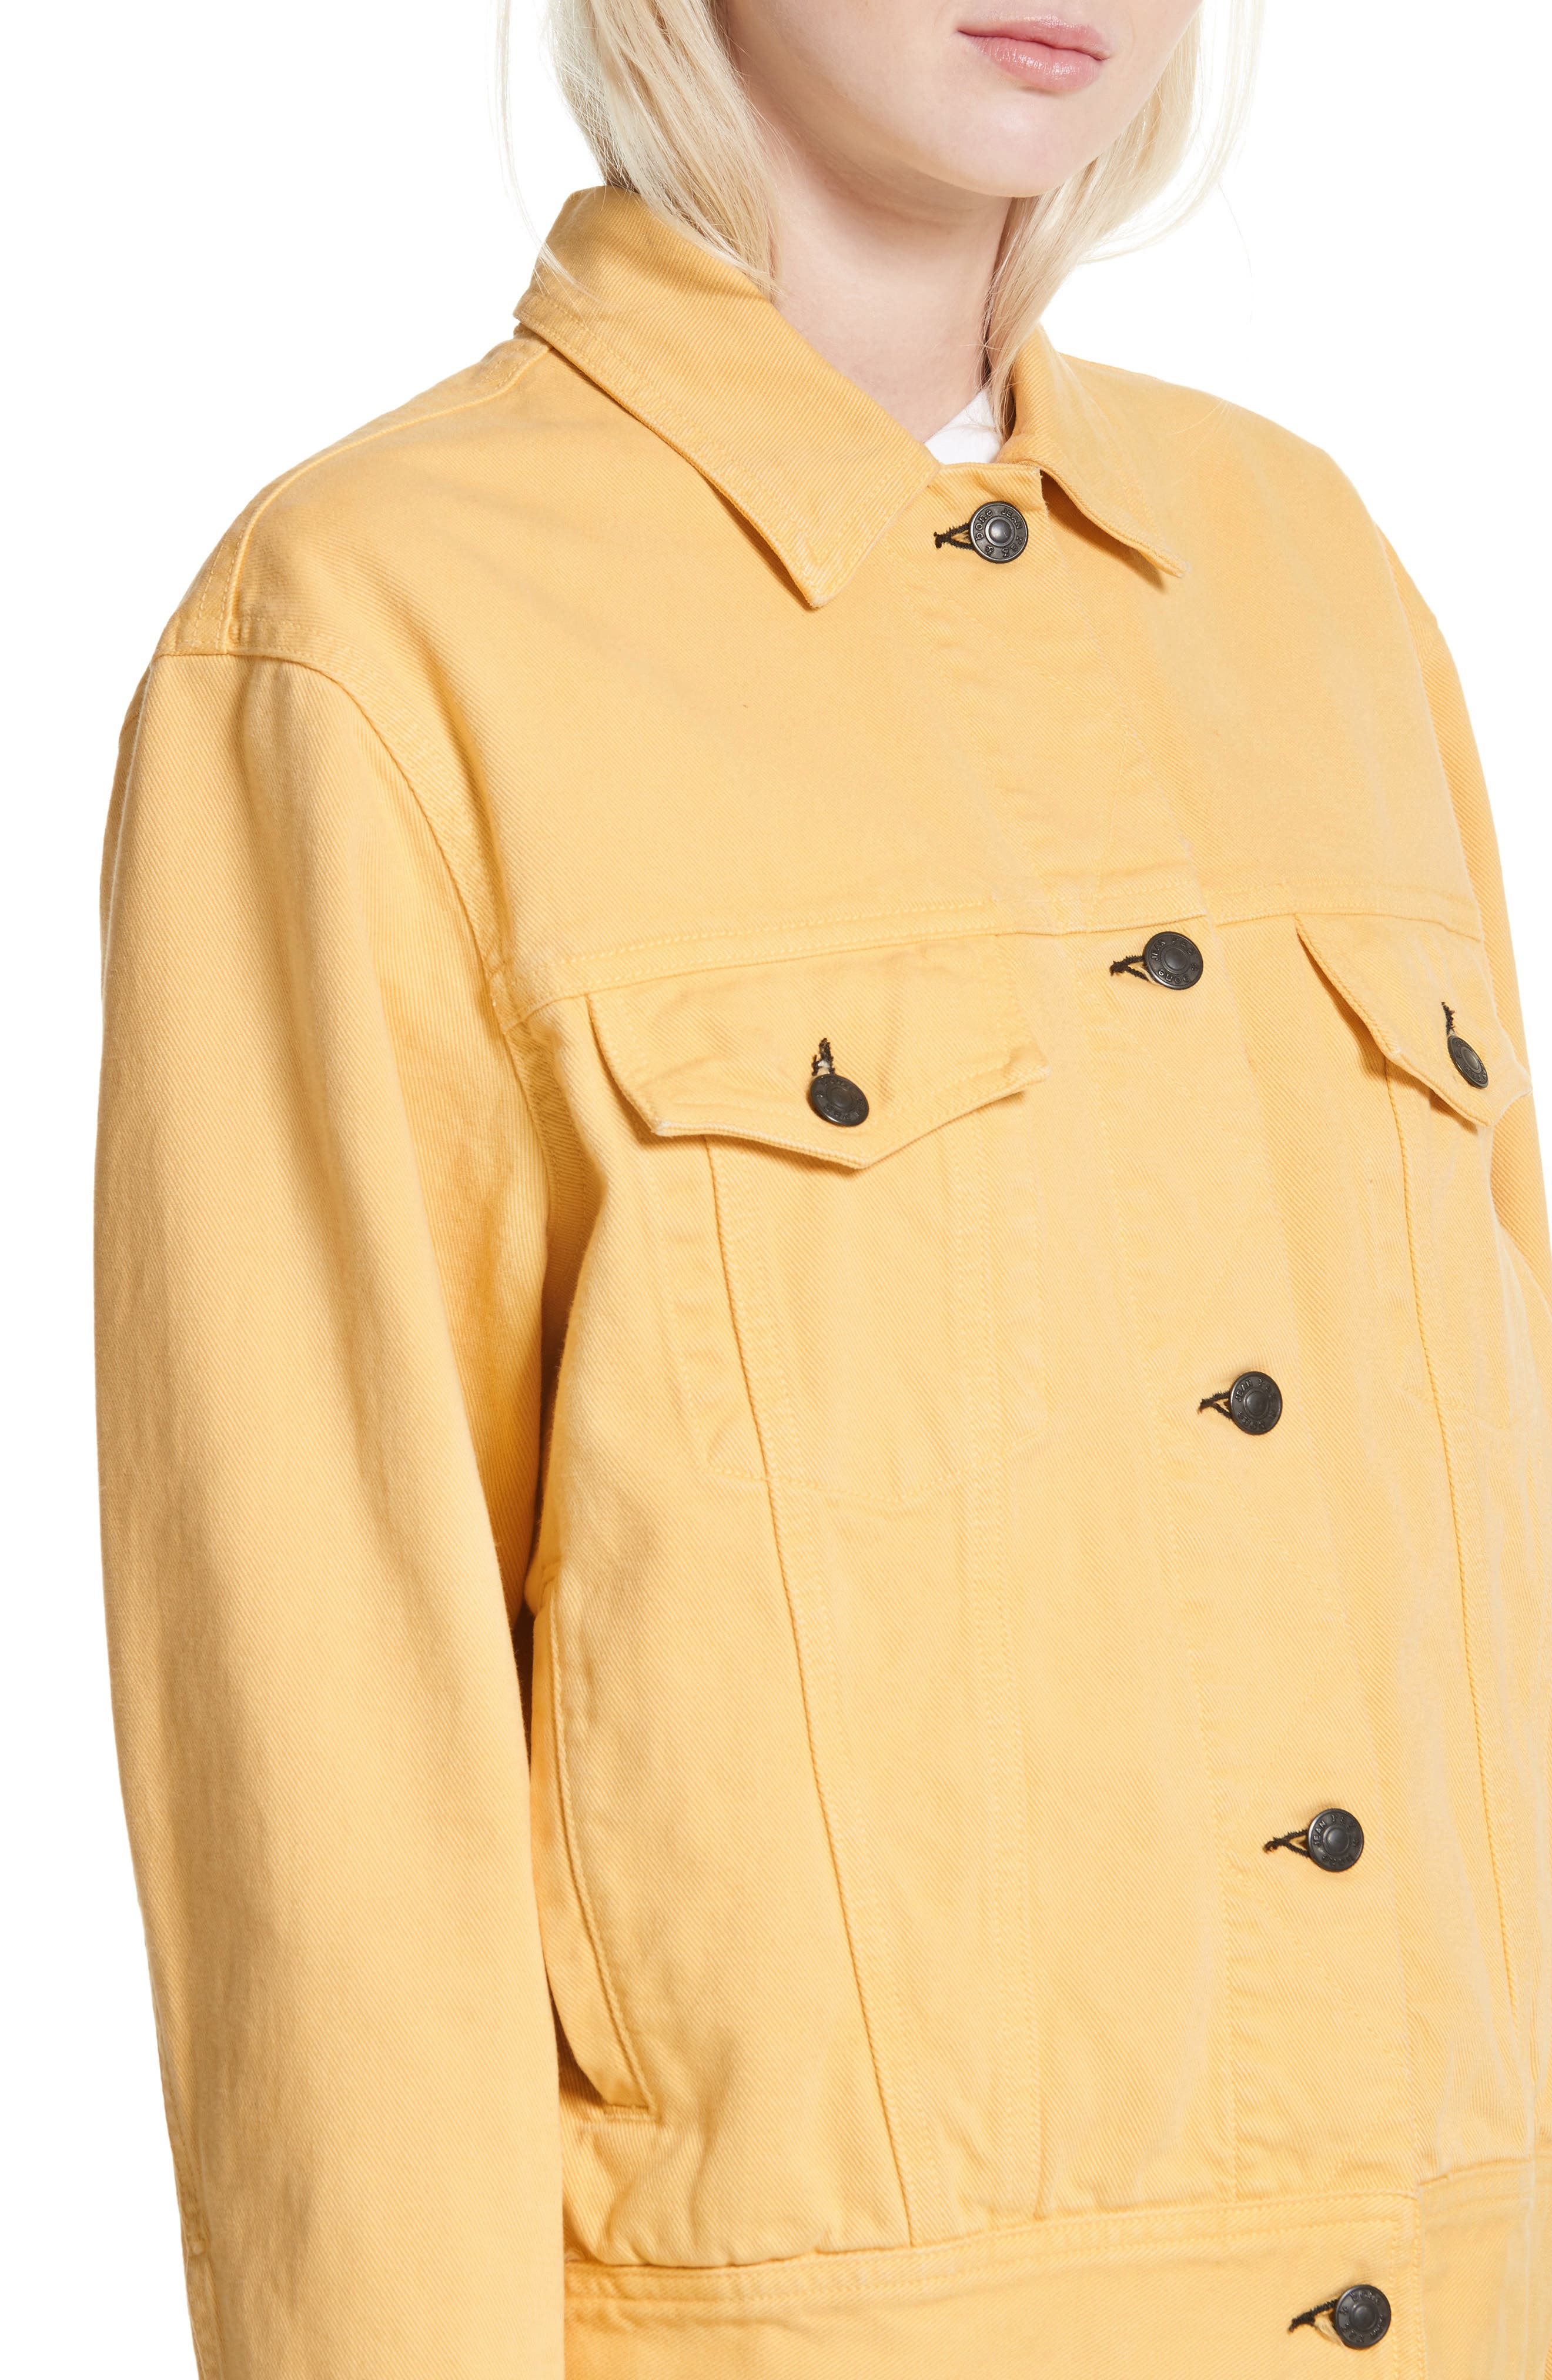 rag & bone Oversize Twill Jacket,                             Alternate thumbnail 4, color,                             730